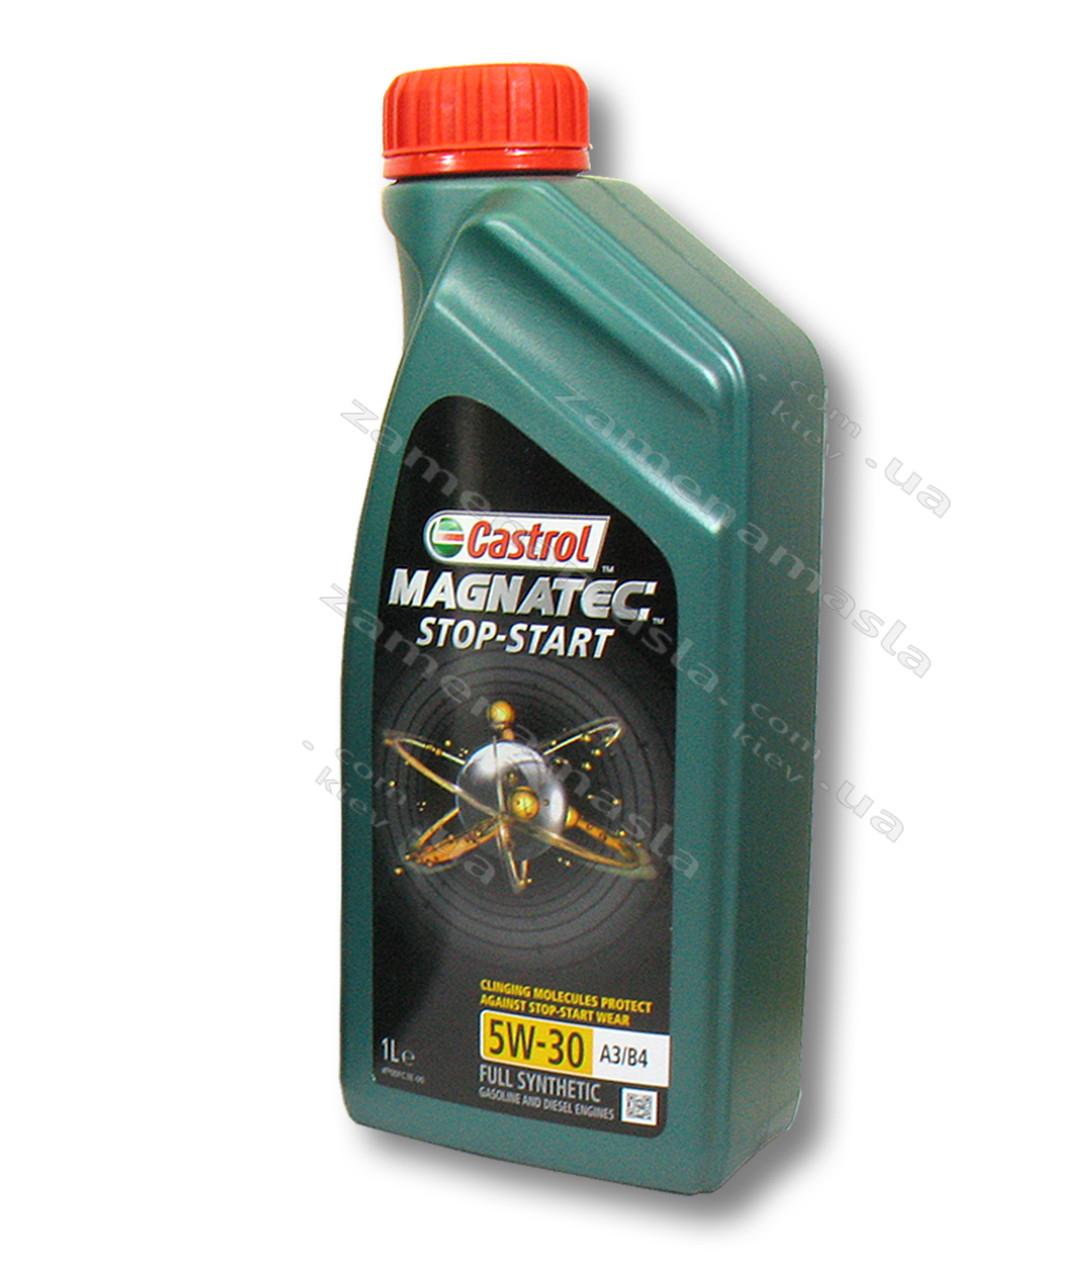 Castrol MAGNATEC STOP-START 5W-30 A3/B4 1л - моторное масло